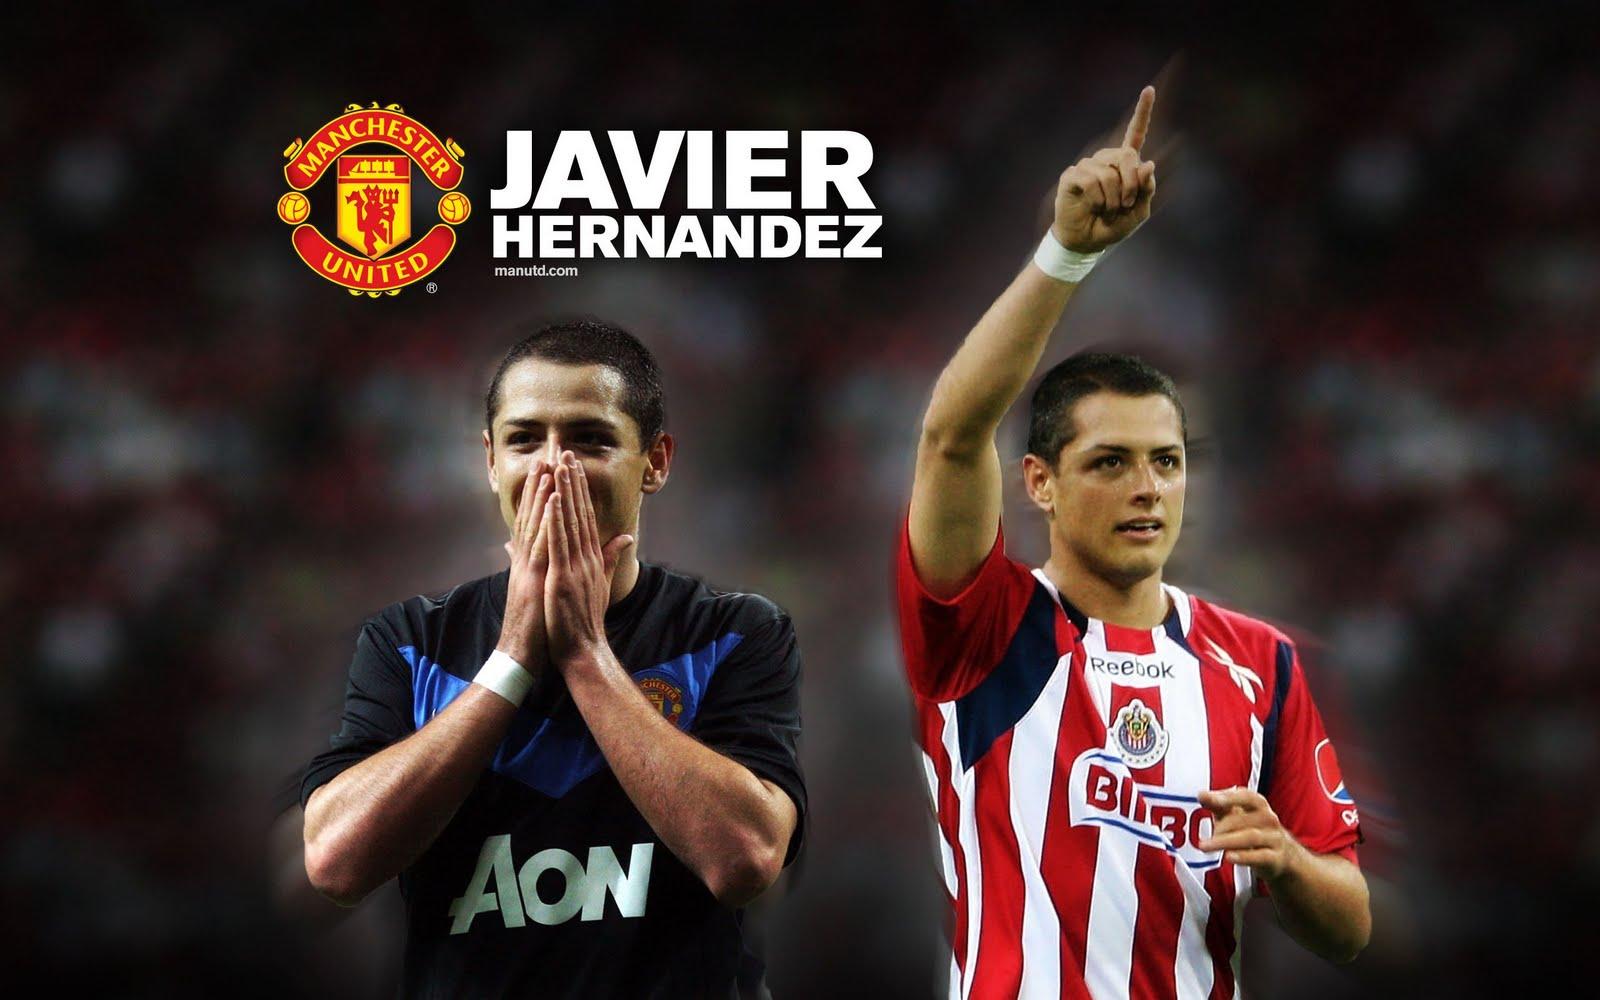 The Best Football Wallpaper: Javier Hernandez Wallpapers